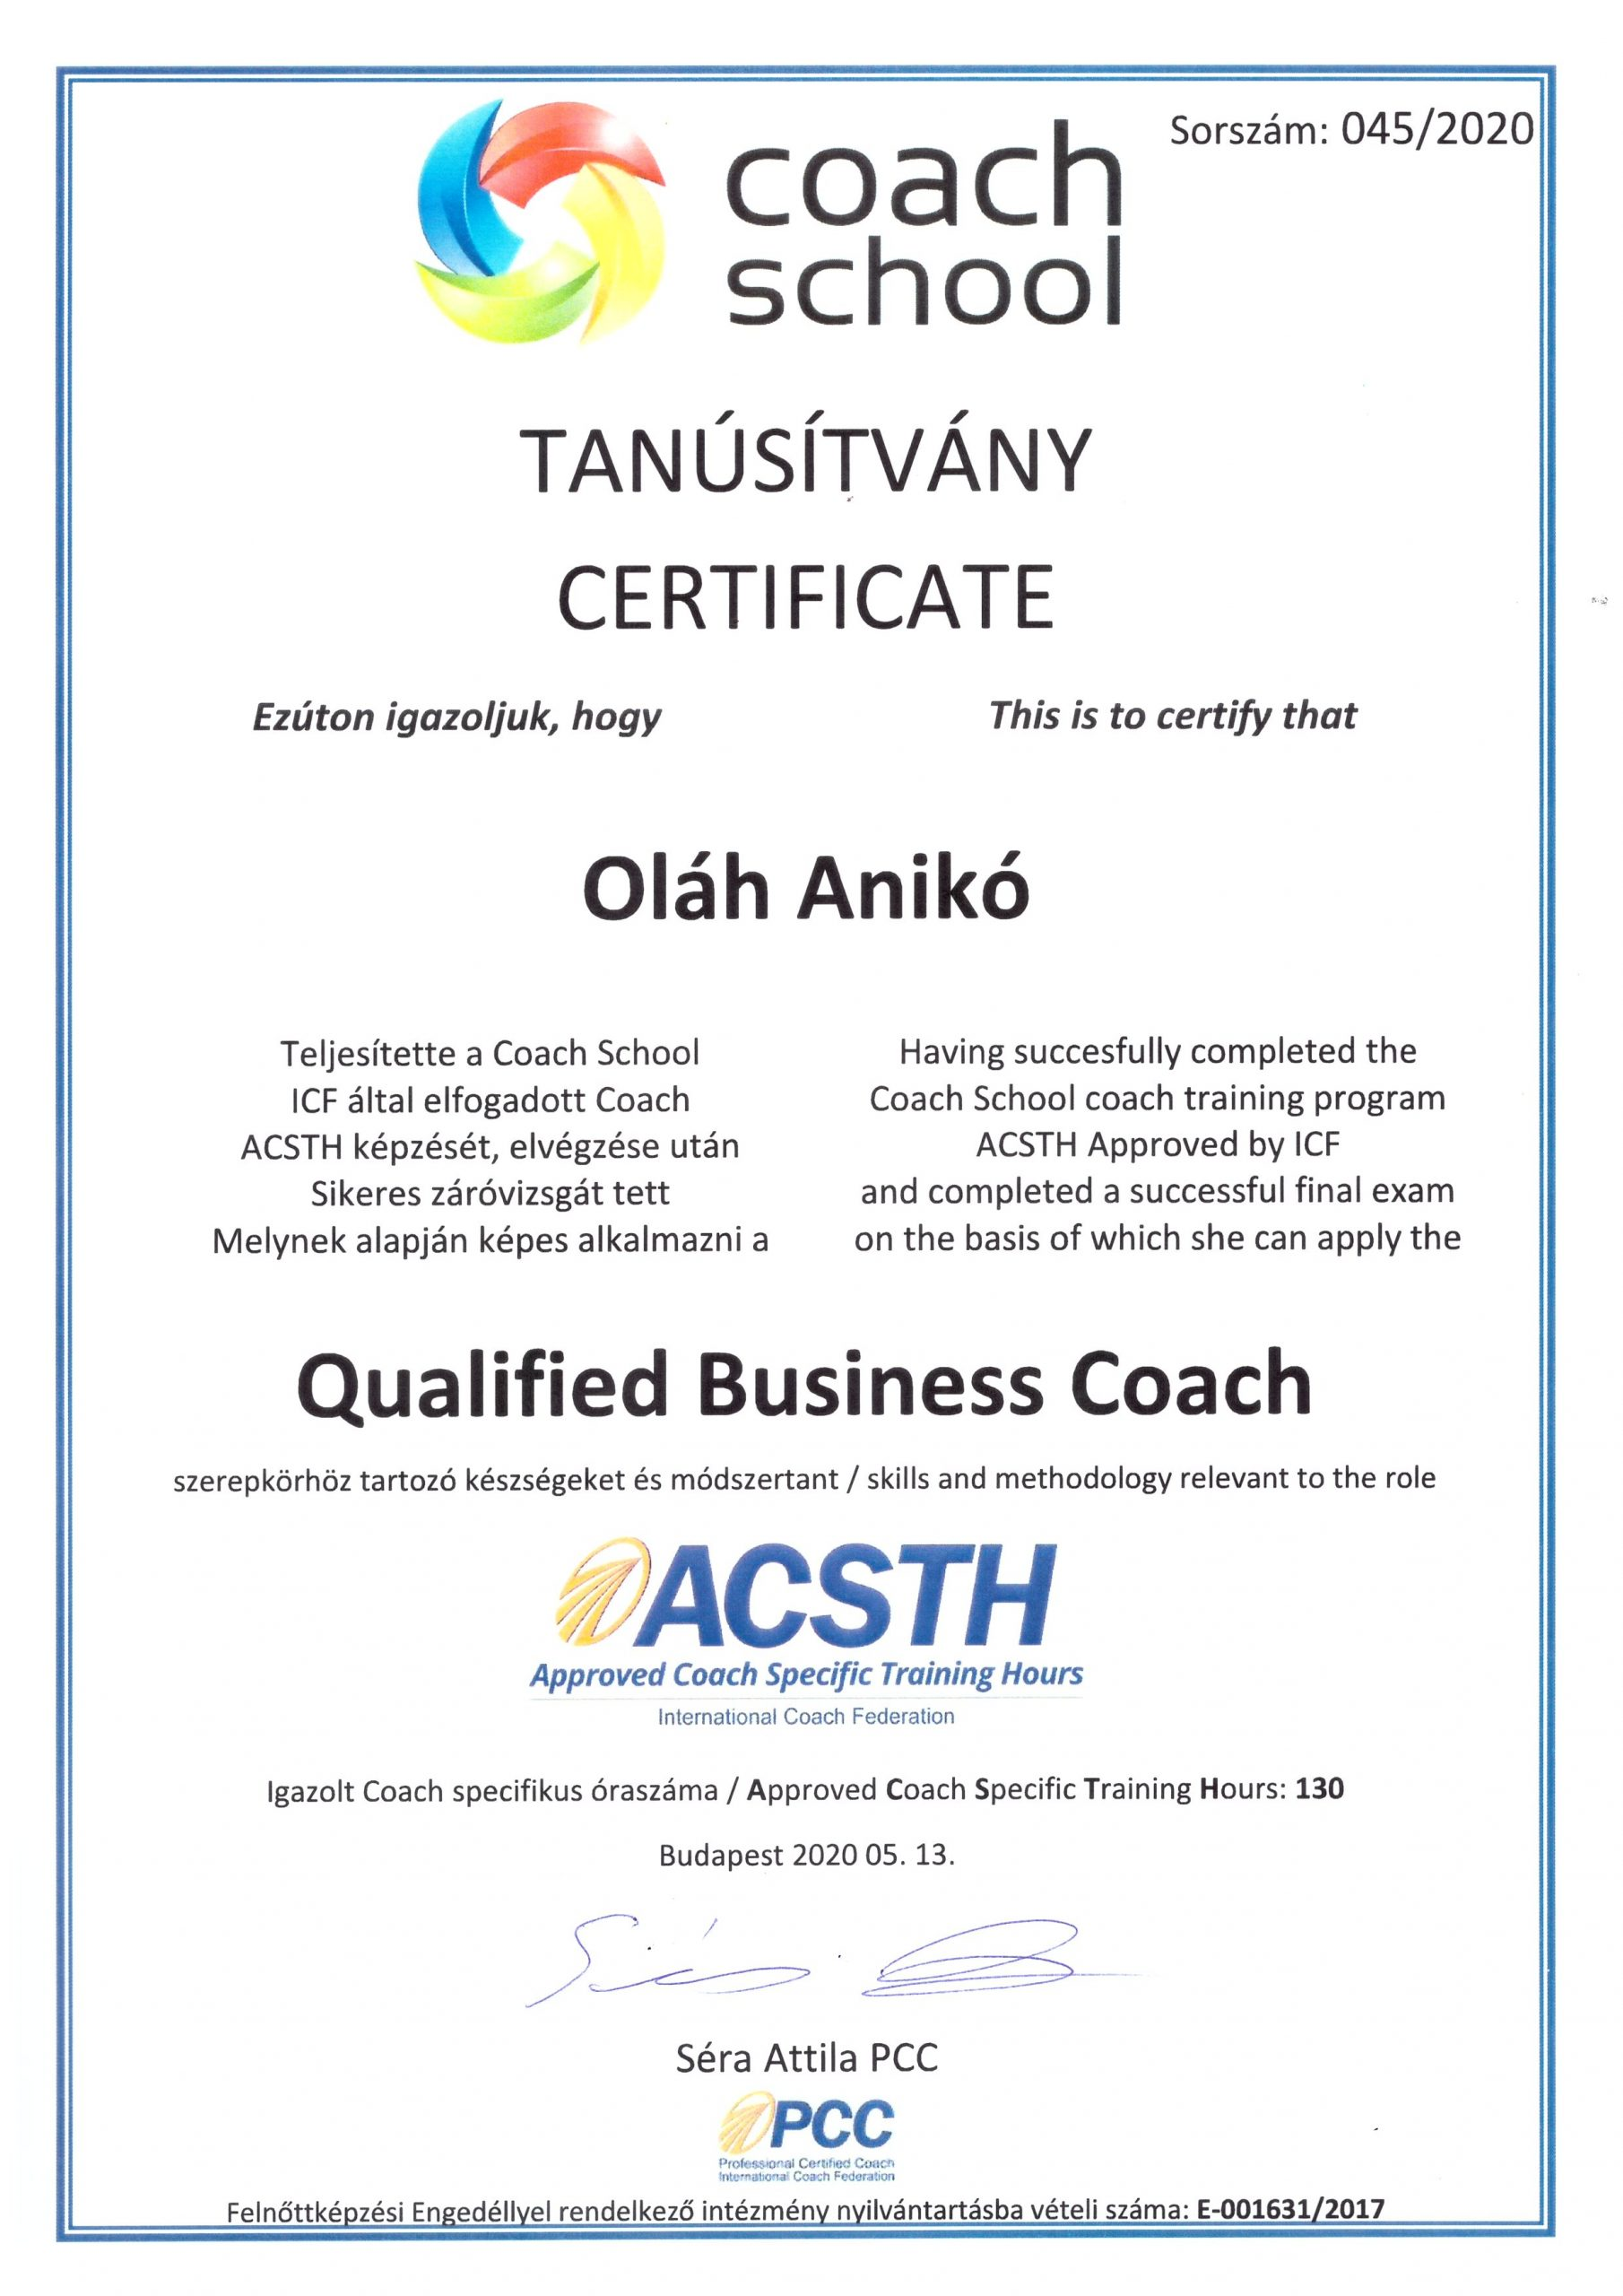 Oláh Anikó ICF accredited qualified business coach